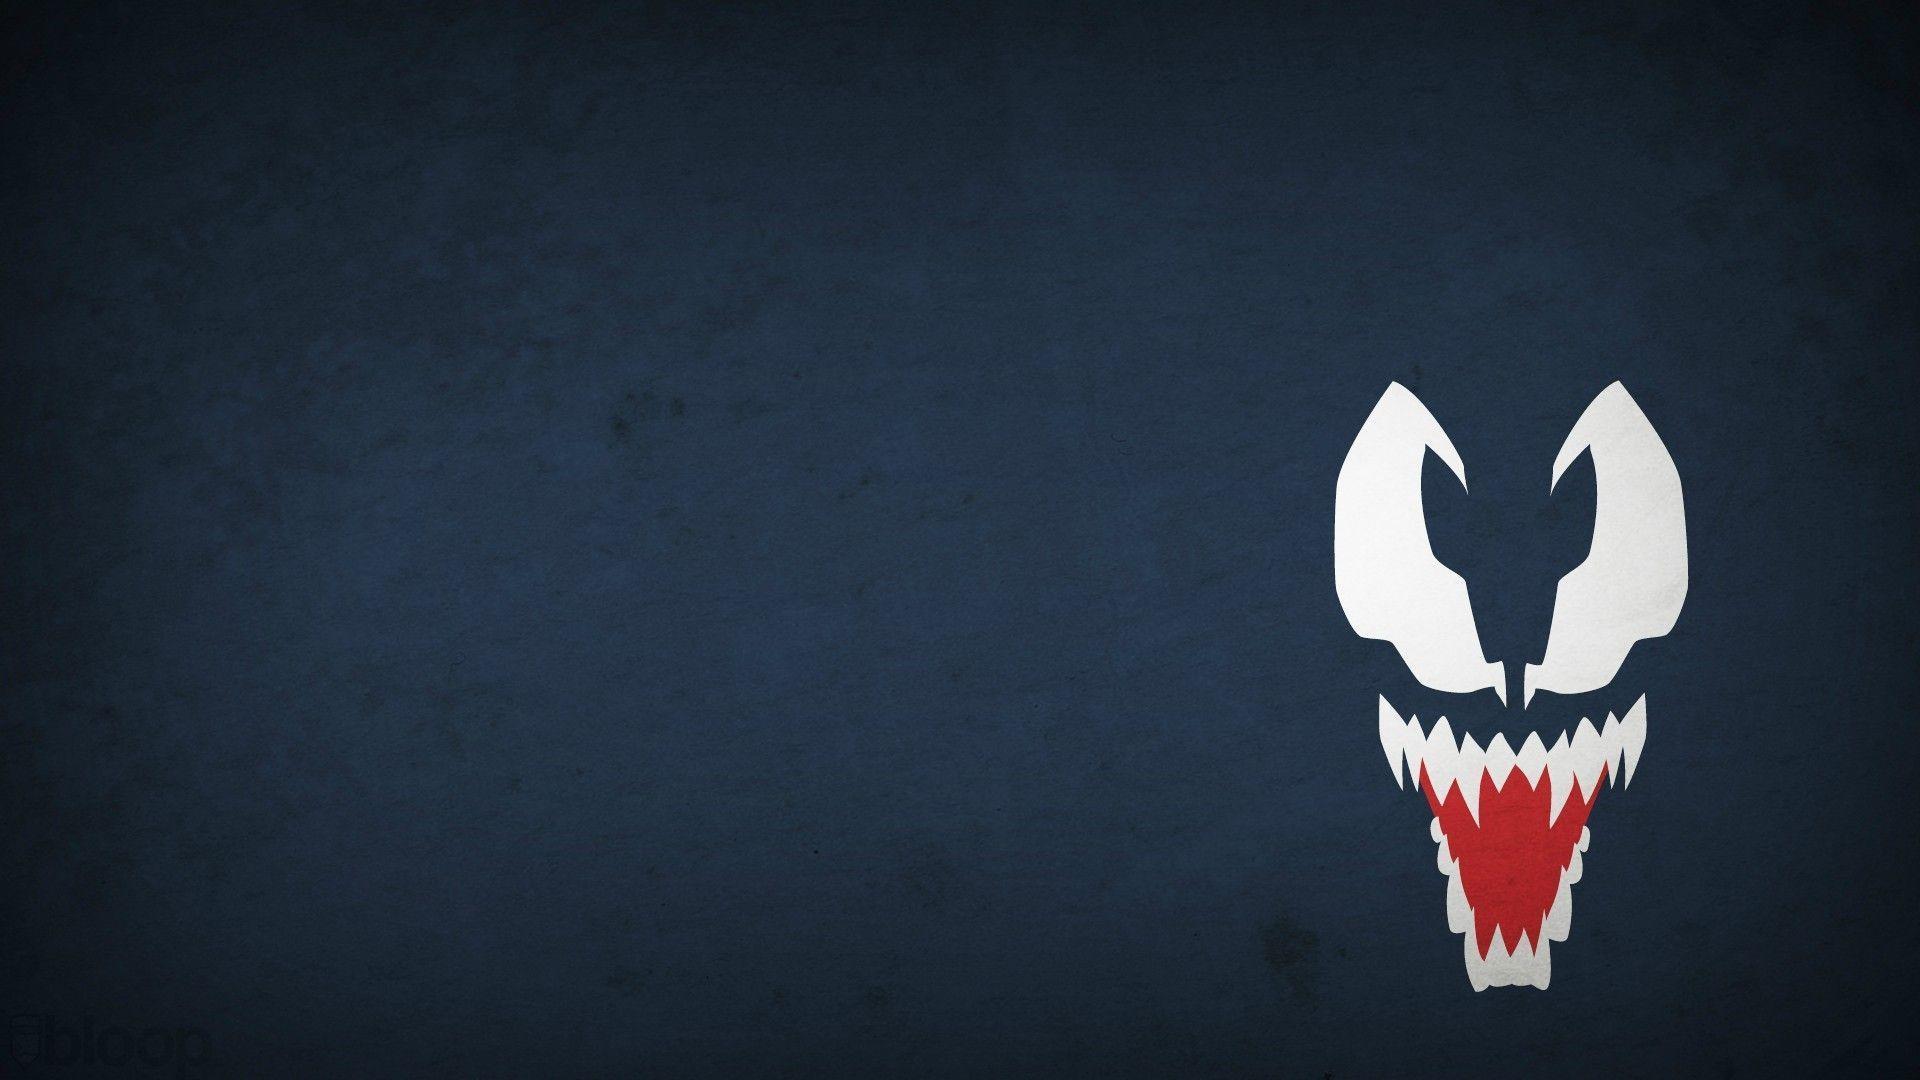 Marvel Venom Wallpapers Hd Wallpaper Cave